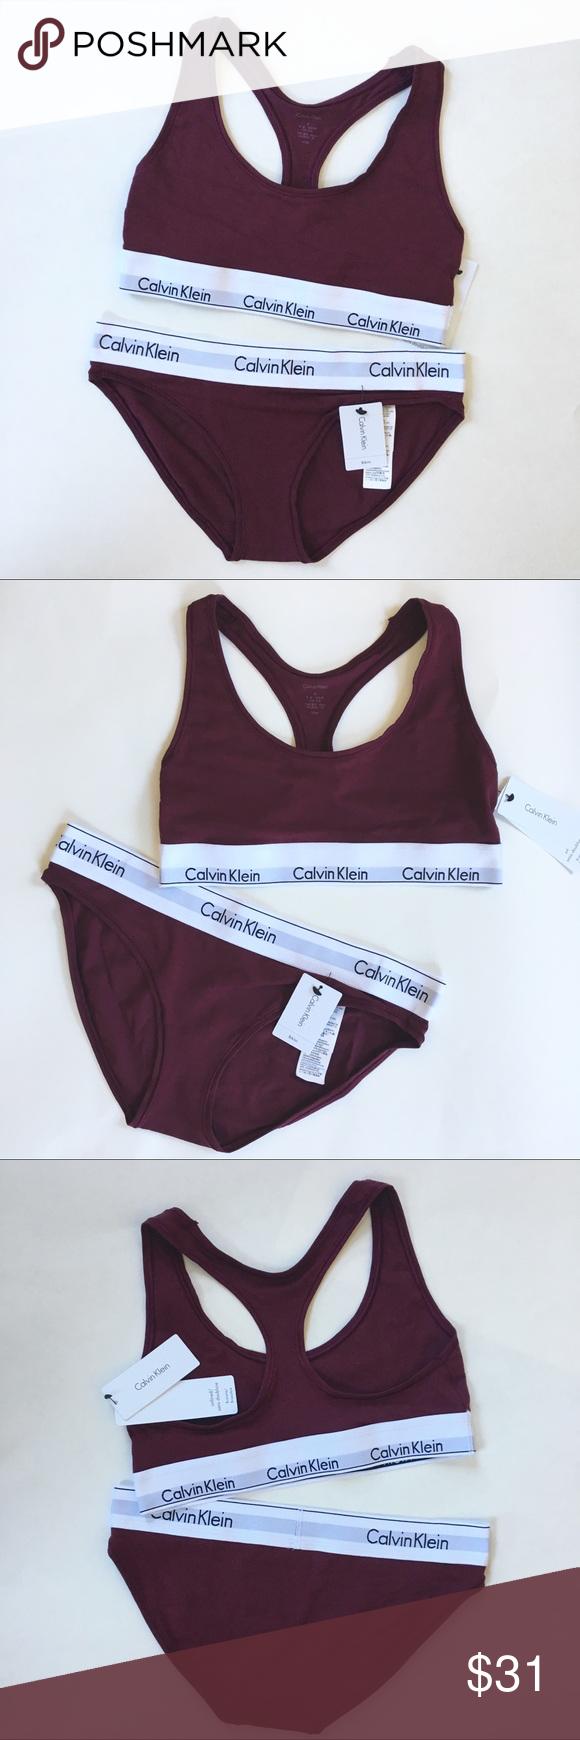 60554c0ffa42 Calvin Klein Maroon Bra & Panty Modern Cotton Set Free Shipping 📦💕 Brand  new with